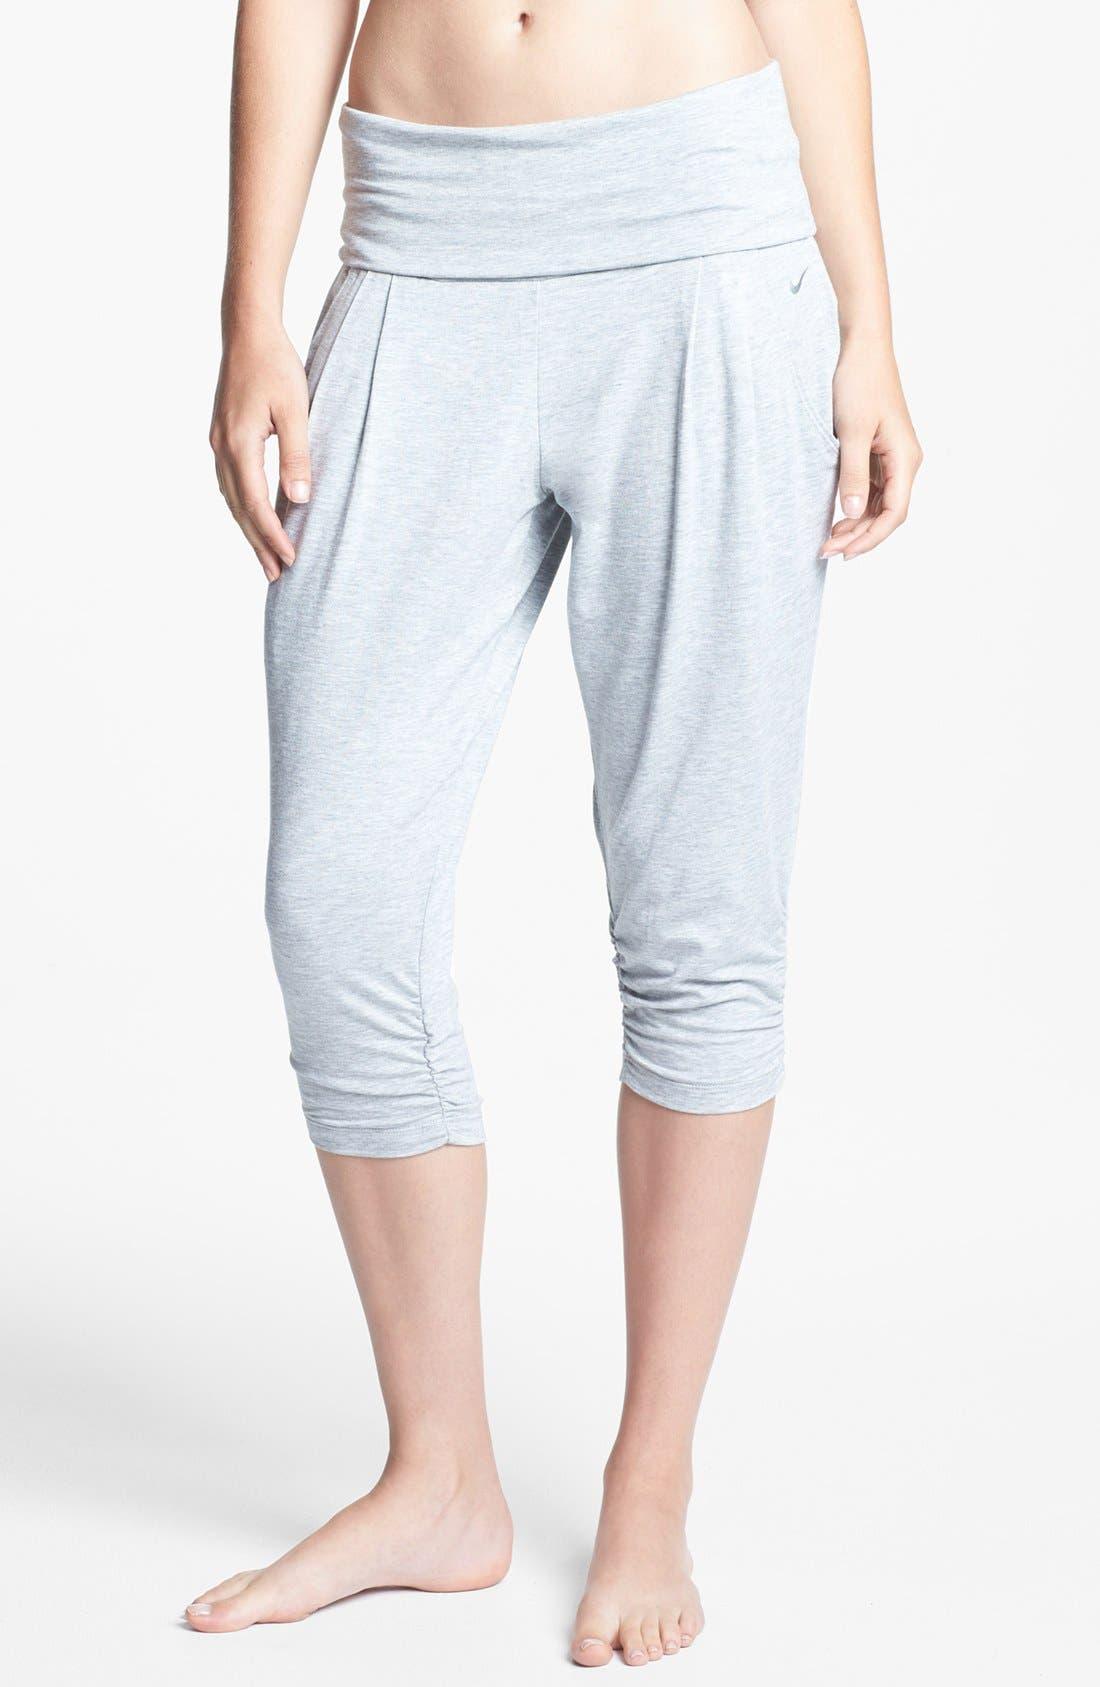 Alternate Image 1 Selected - Nike 'Ace' Crop Pants